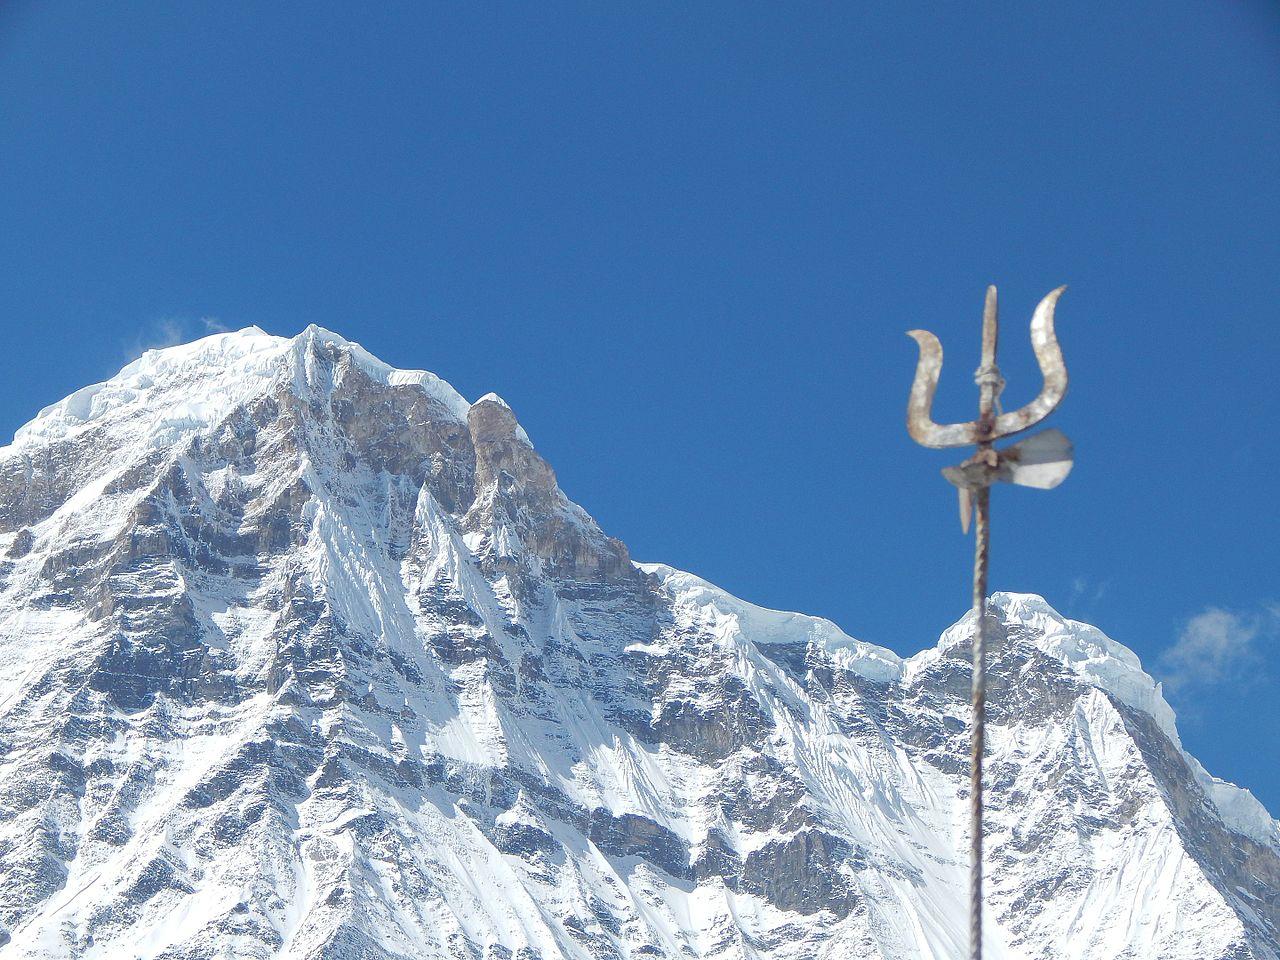 Lord shiva trishul picture - File Top Of Annapurna The Great Lord Shiva S Trishul On The Base Jpg